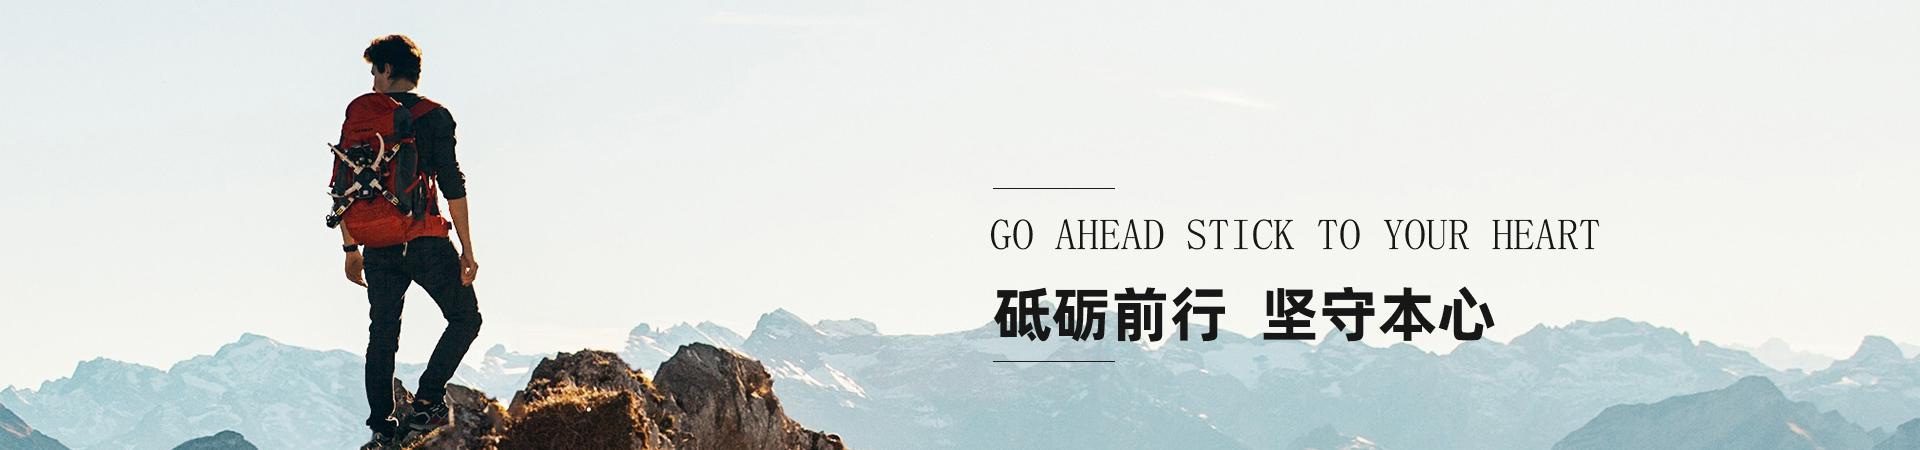 http://www.jszjxmgl.cn/data/upload/201911/20191121141318_549.jpg